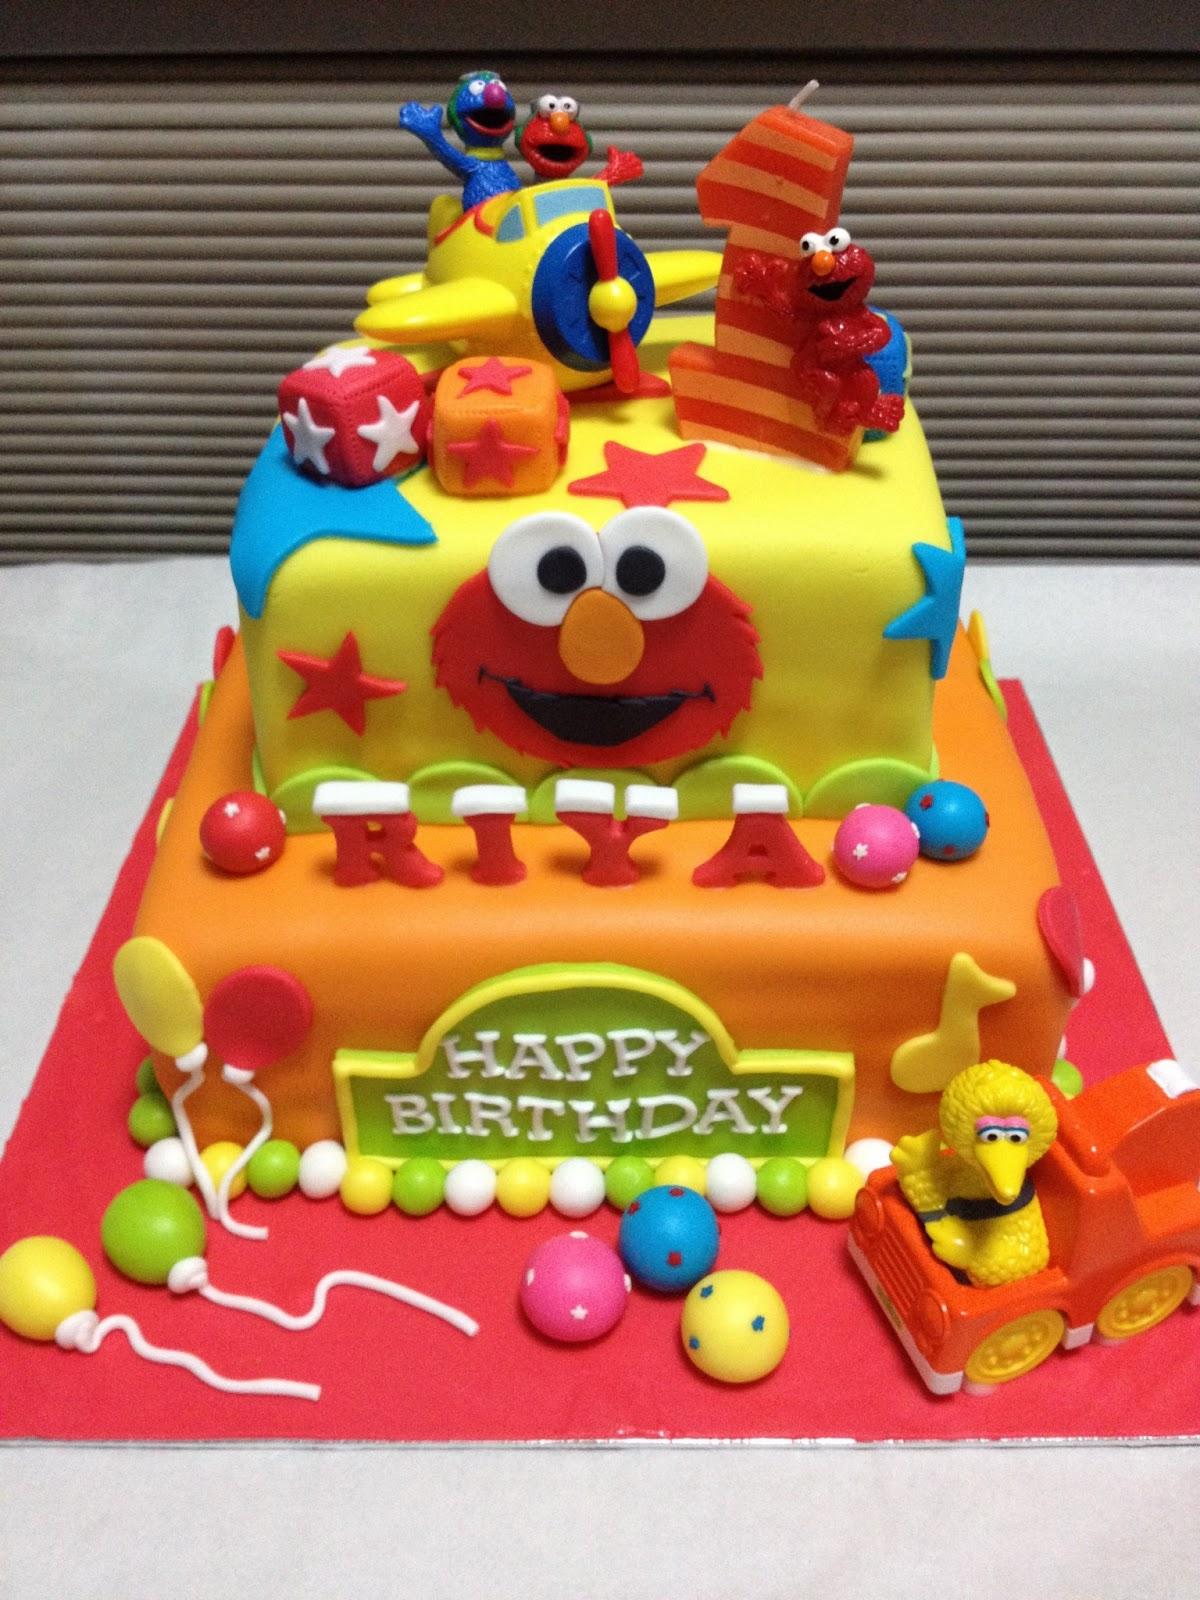 Cake Images With Name Riya : Oven Creations: Happy 1st Birthday Riya